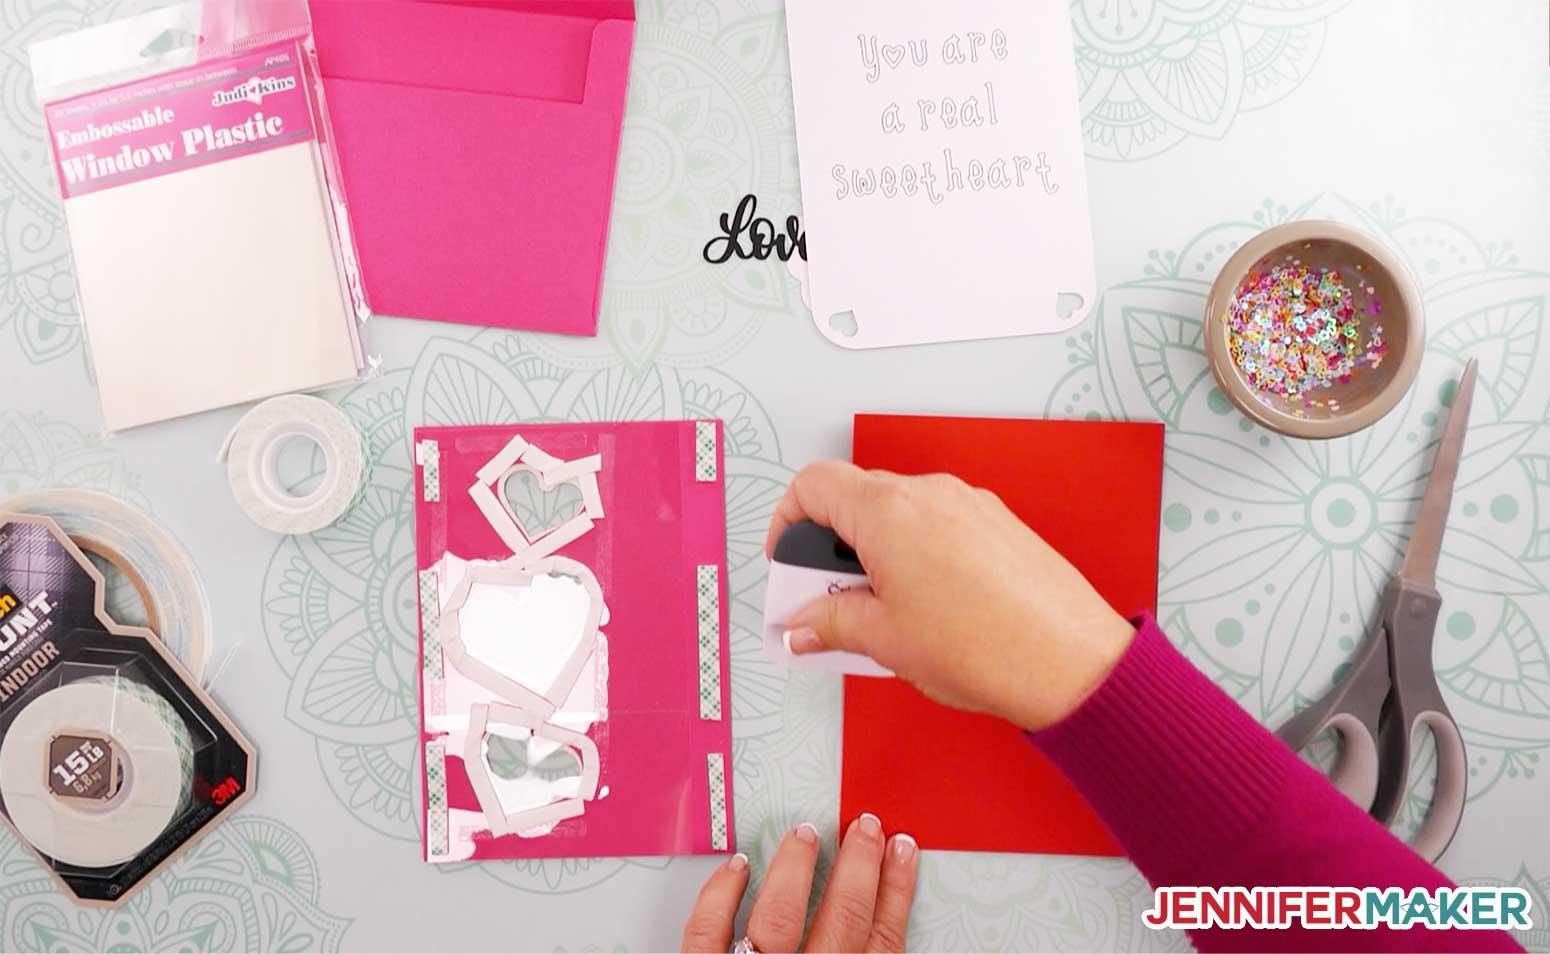 Folding the main shaker card